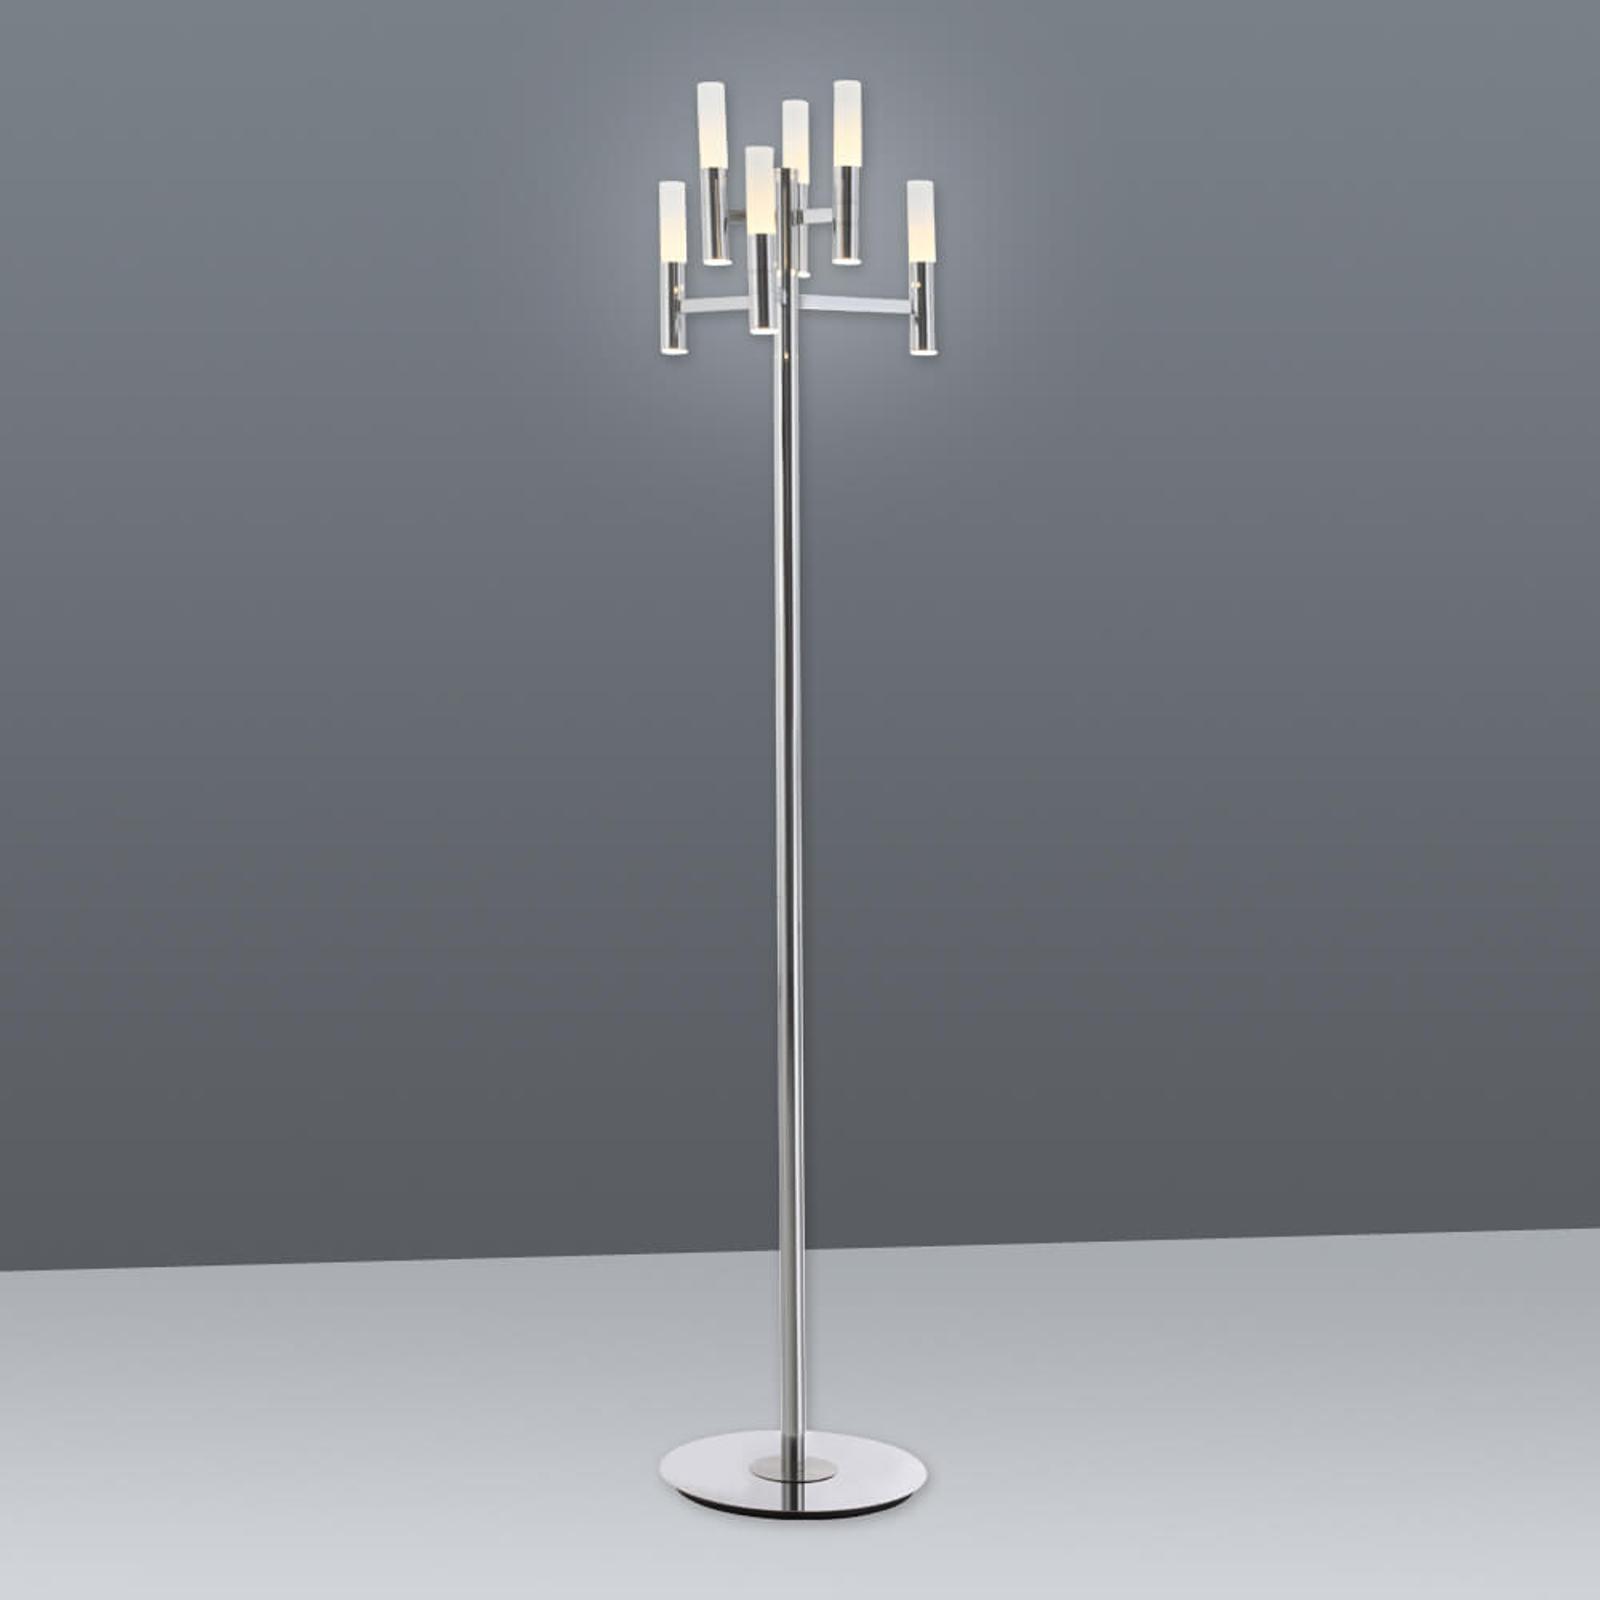 Acquista Lampada LED da terra Irina con touchdimmer 6 luci